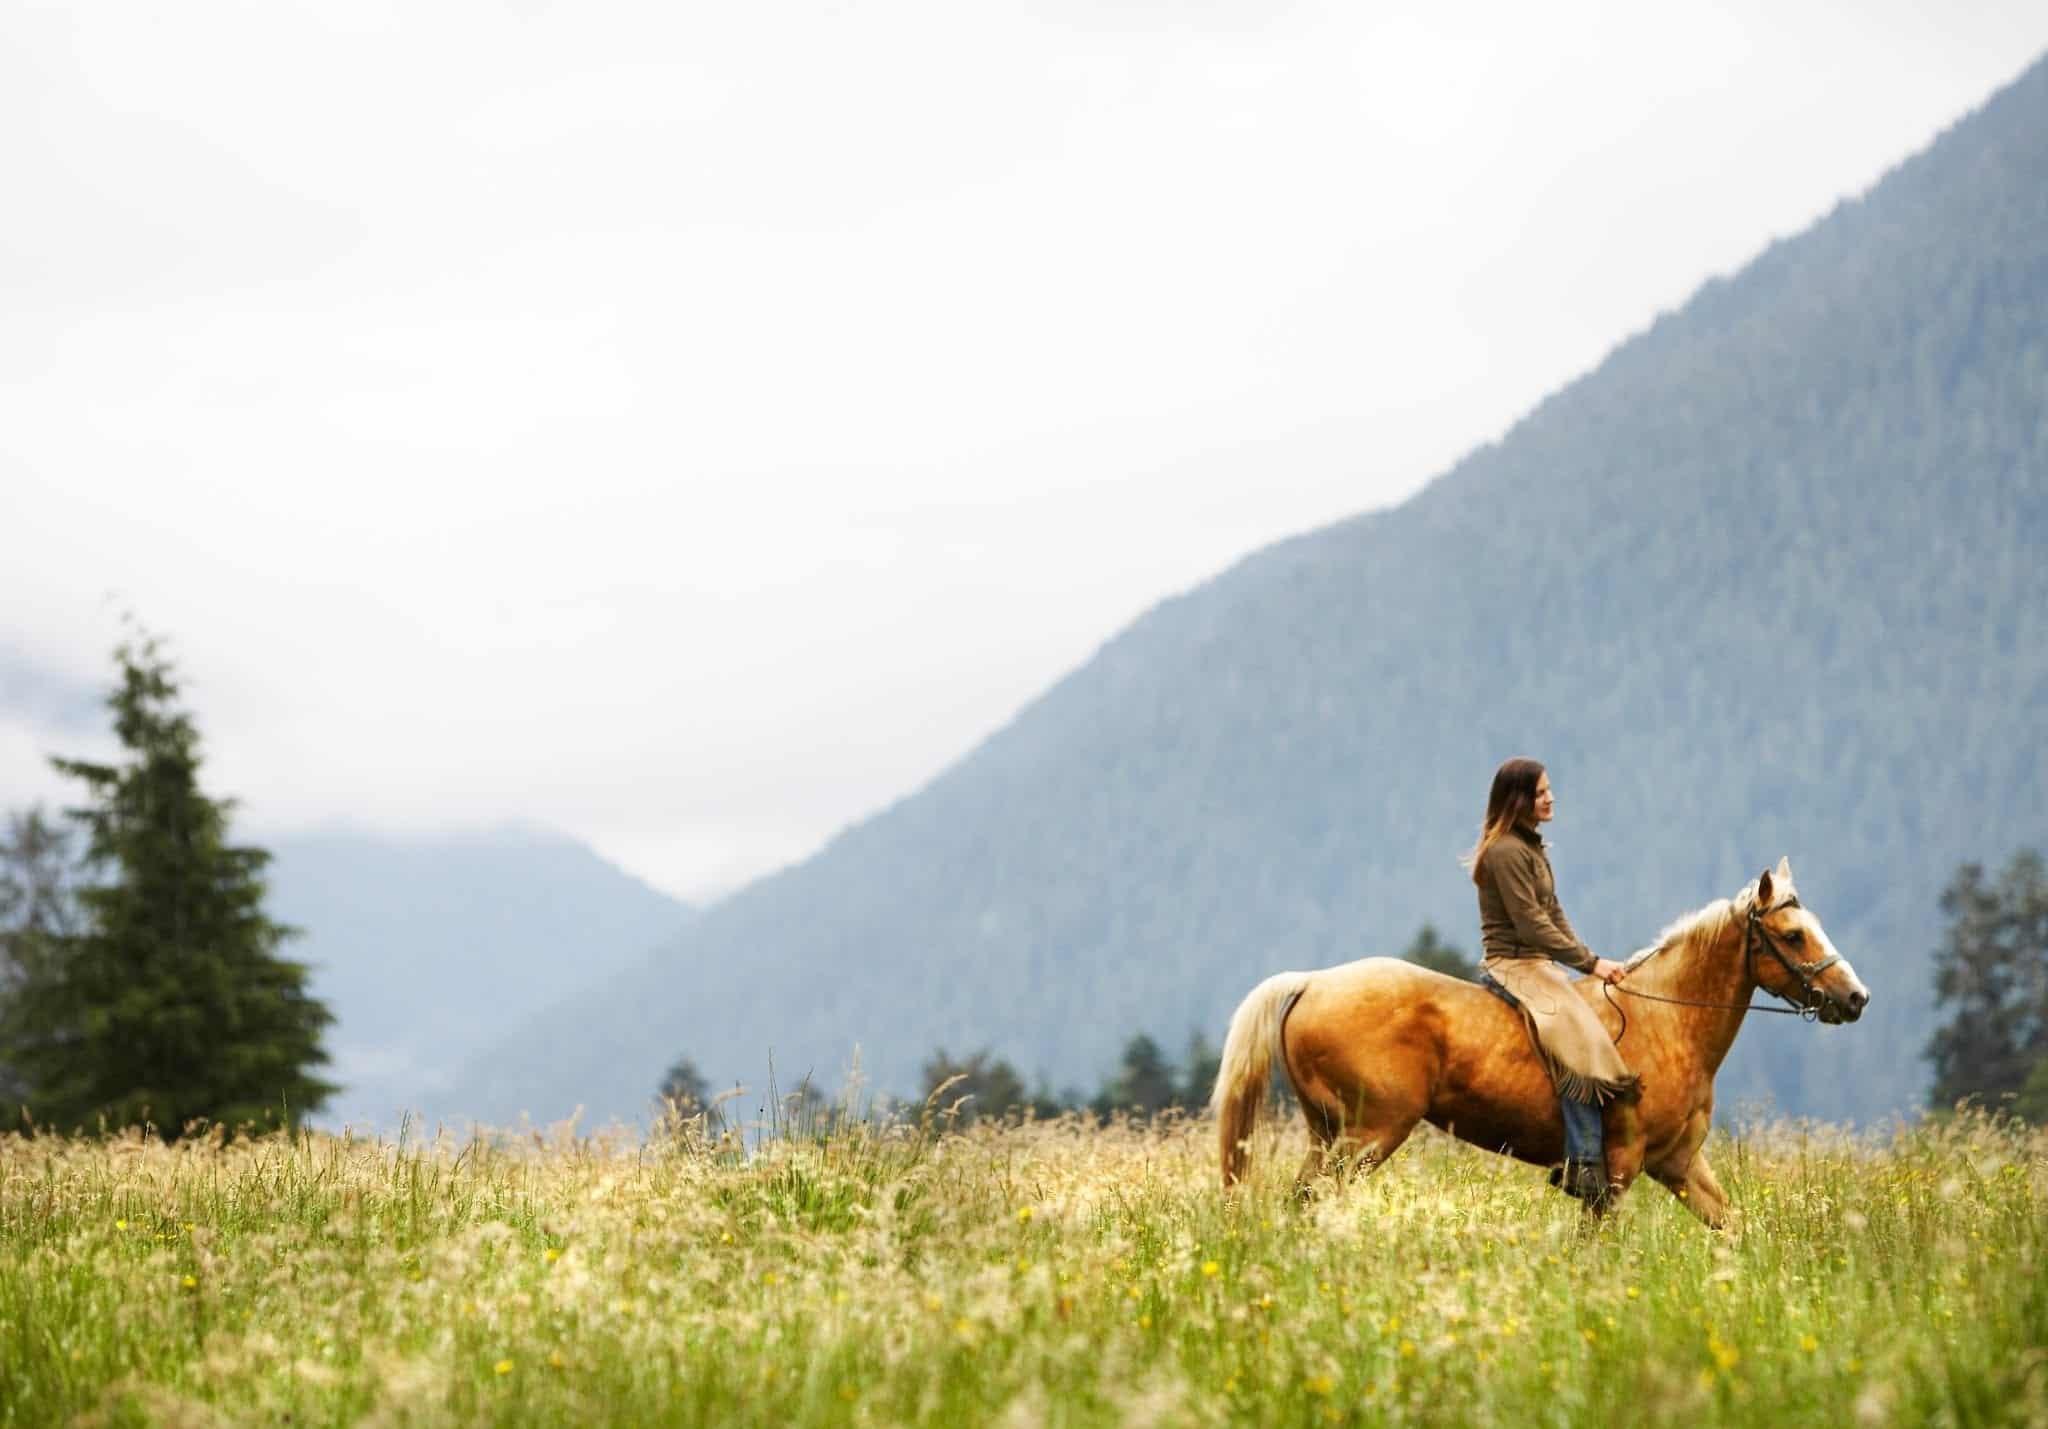 Woman riding horse through field.